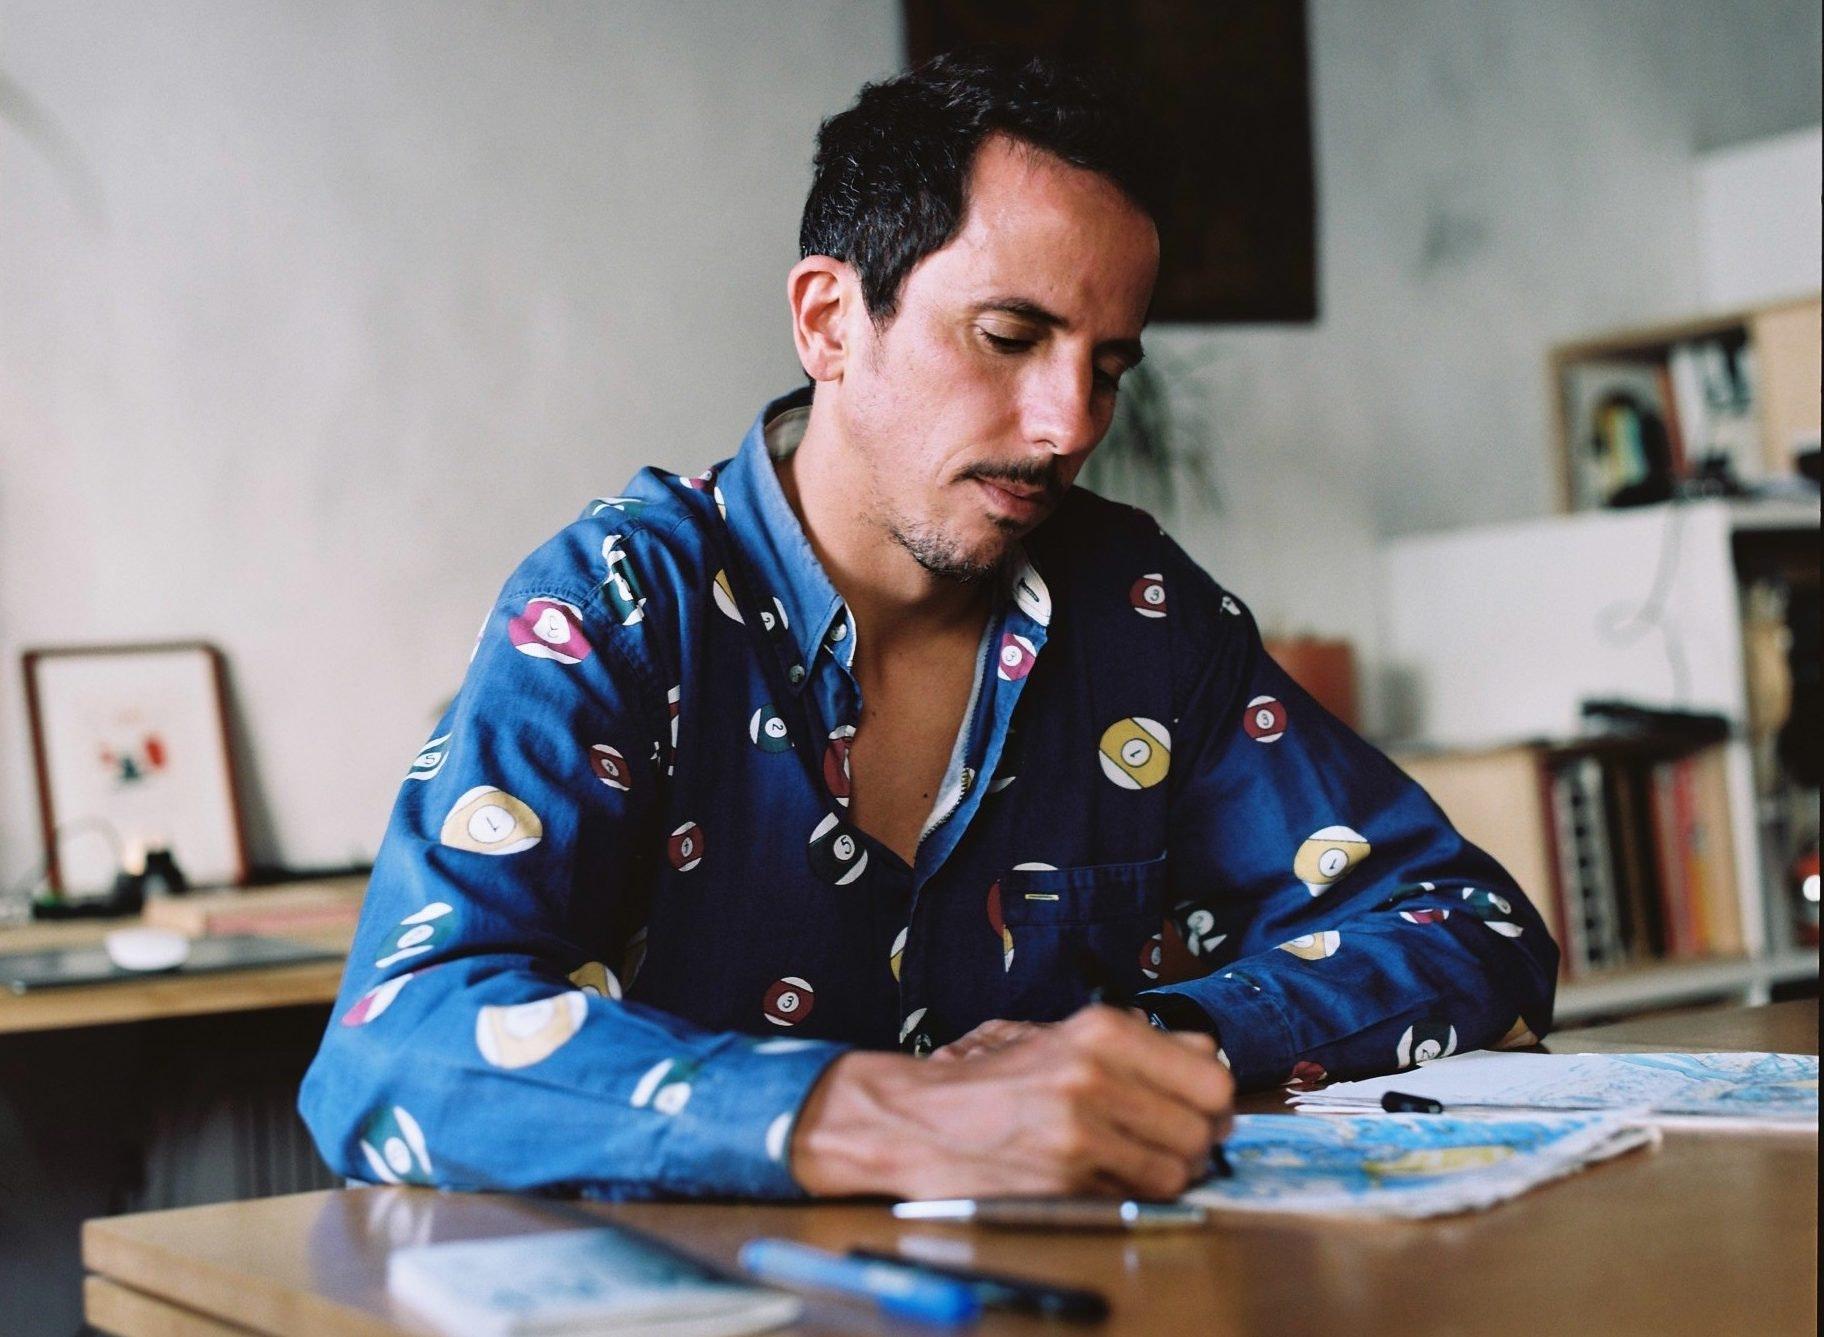 In the studio with Ferran Capo, illustrator for Lonely Planet Magazine